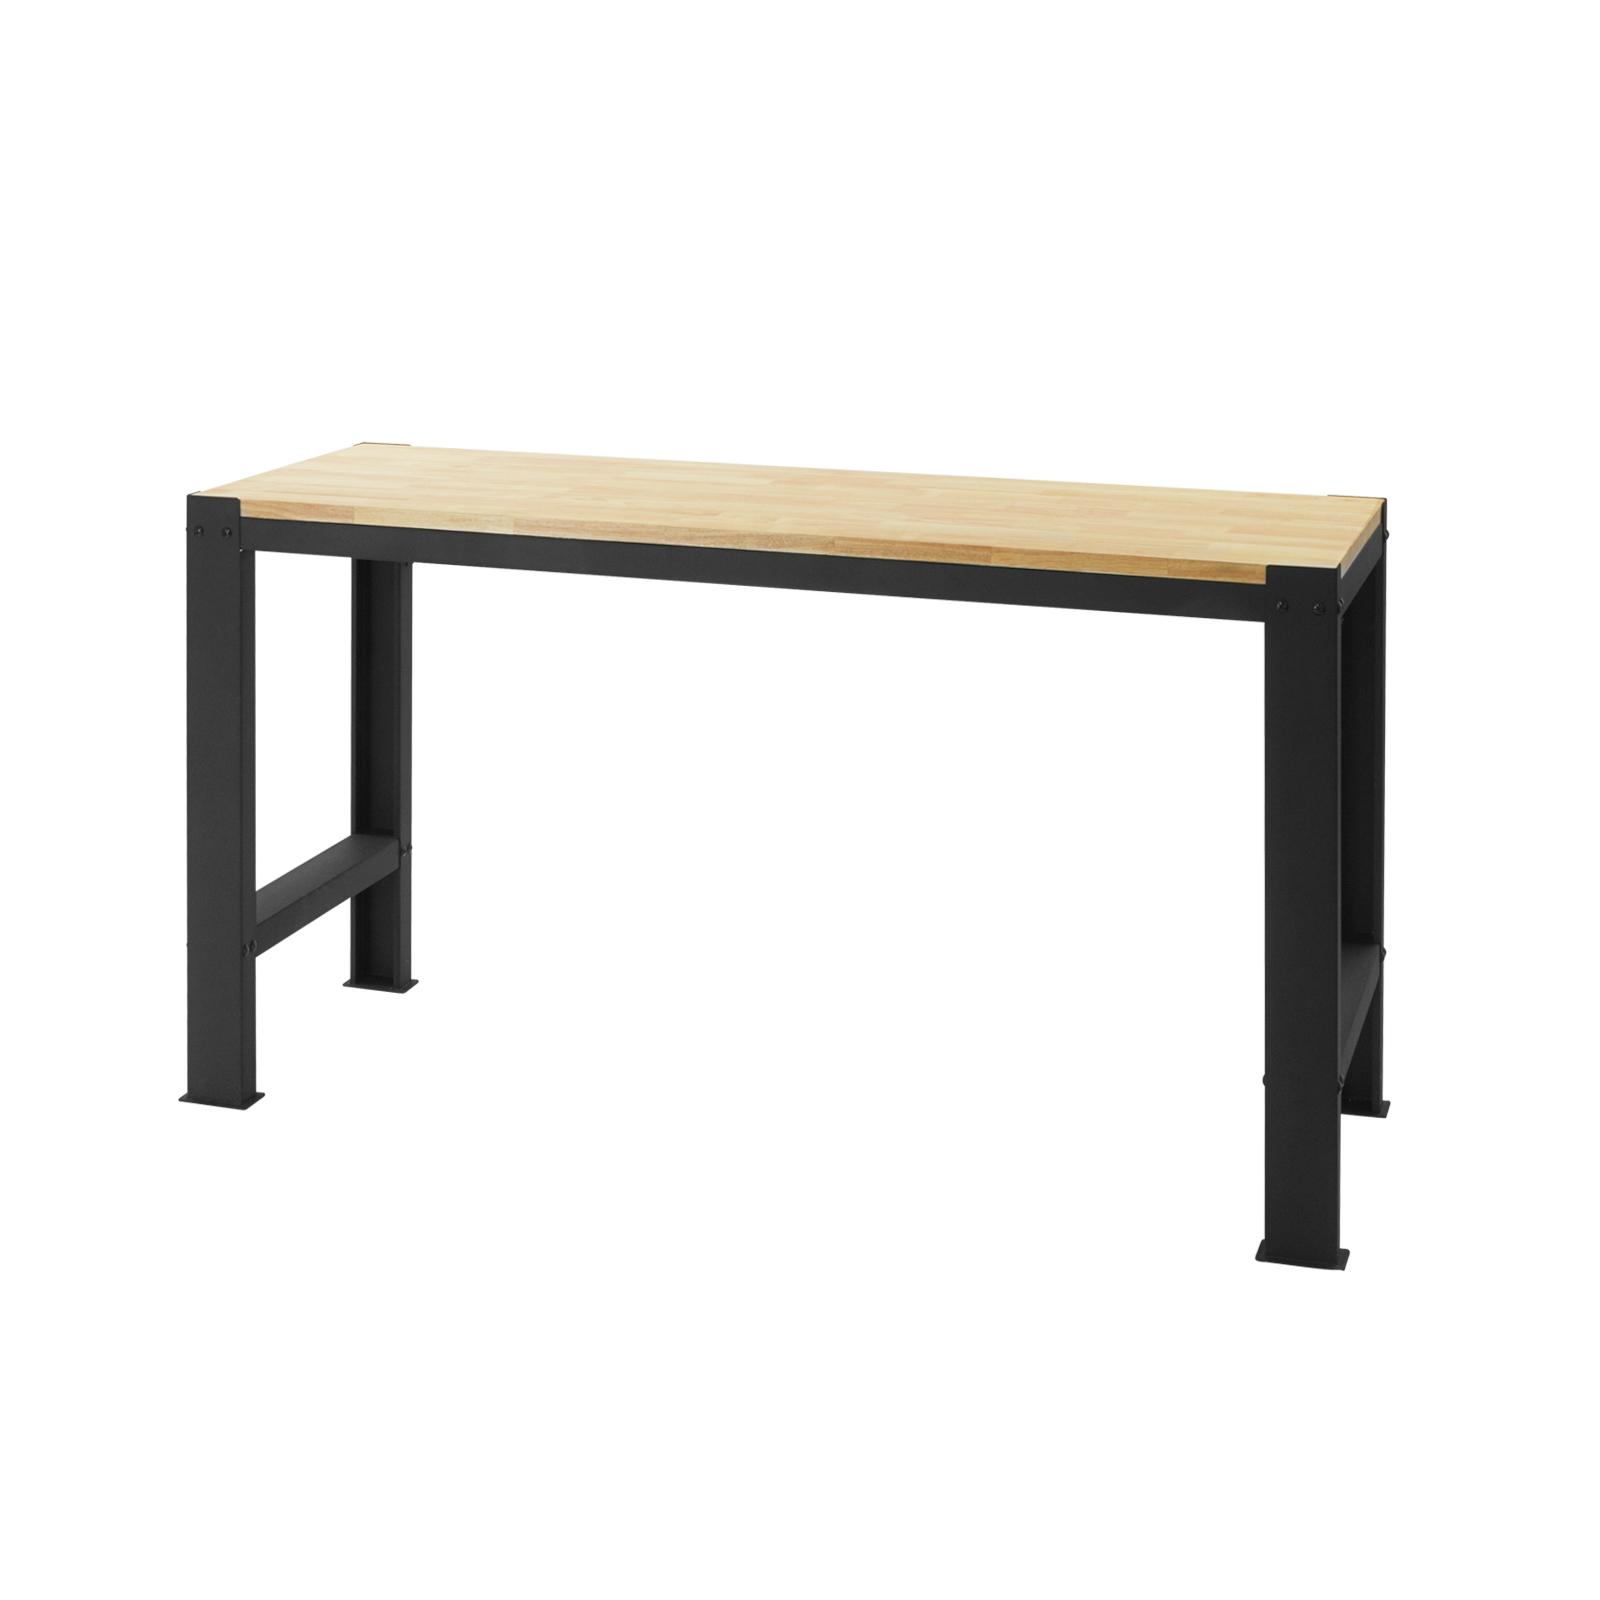 Pinnacle 900 x 1350 x 540mm Timber Top Workbench